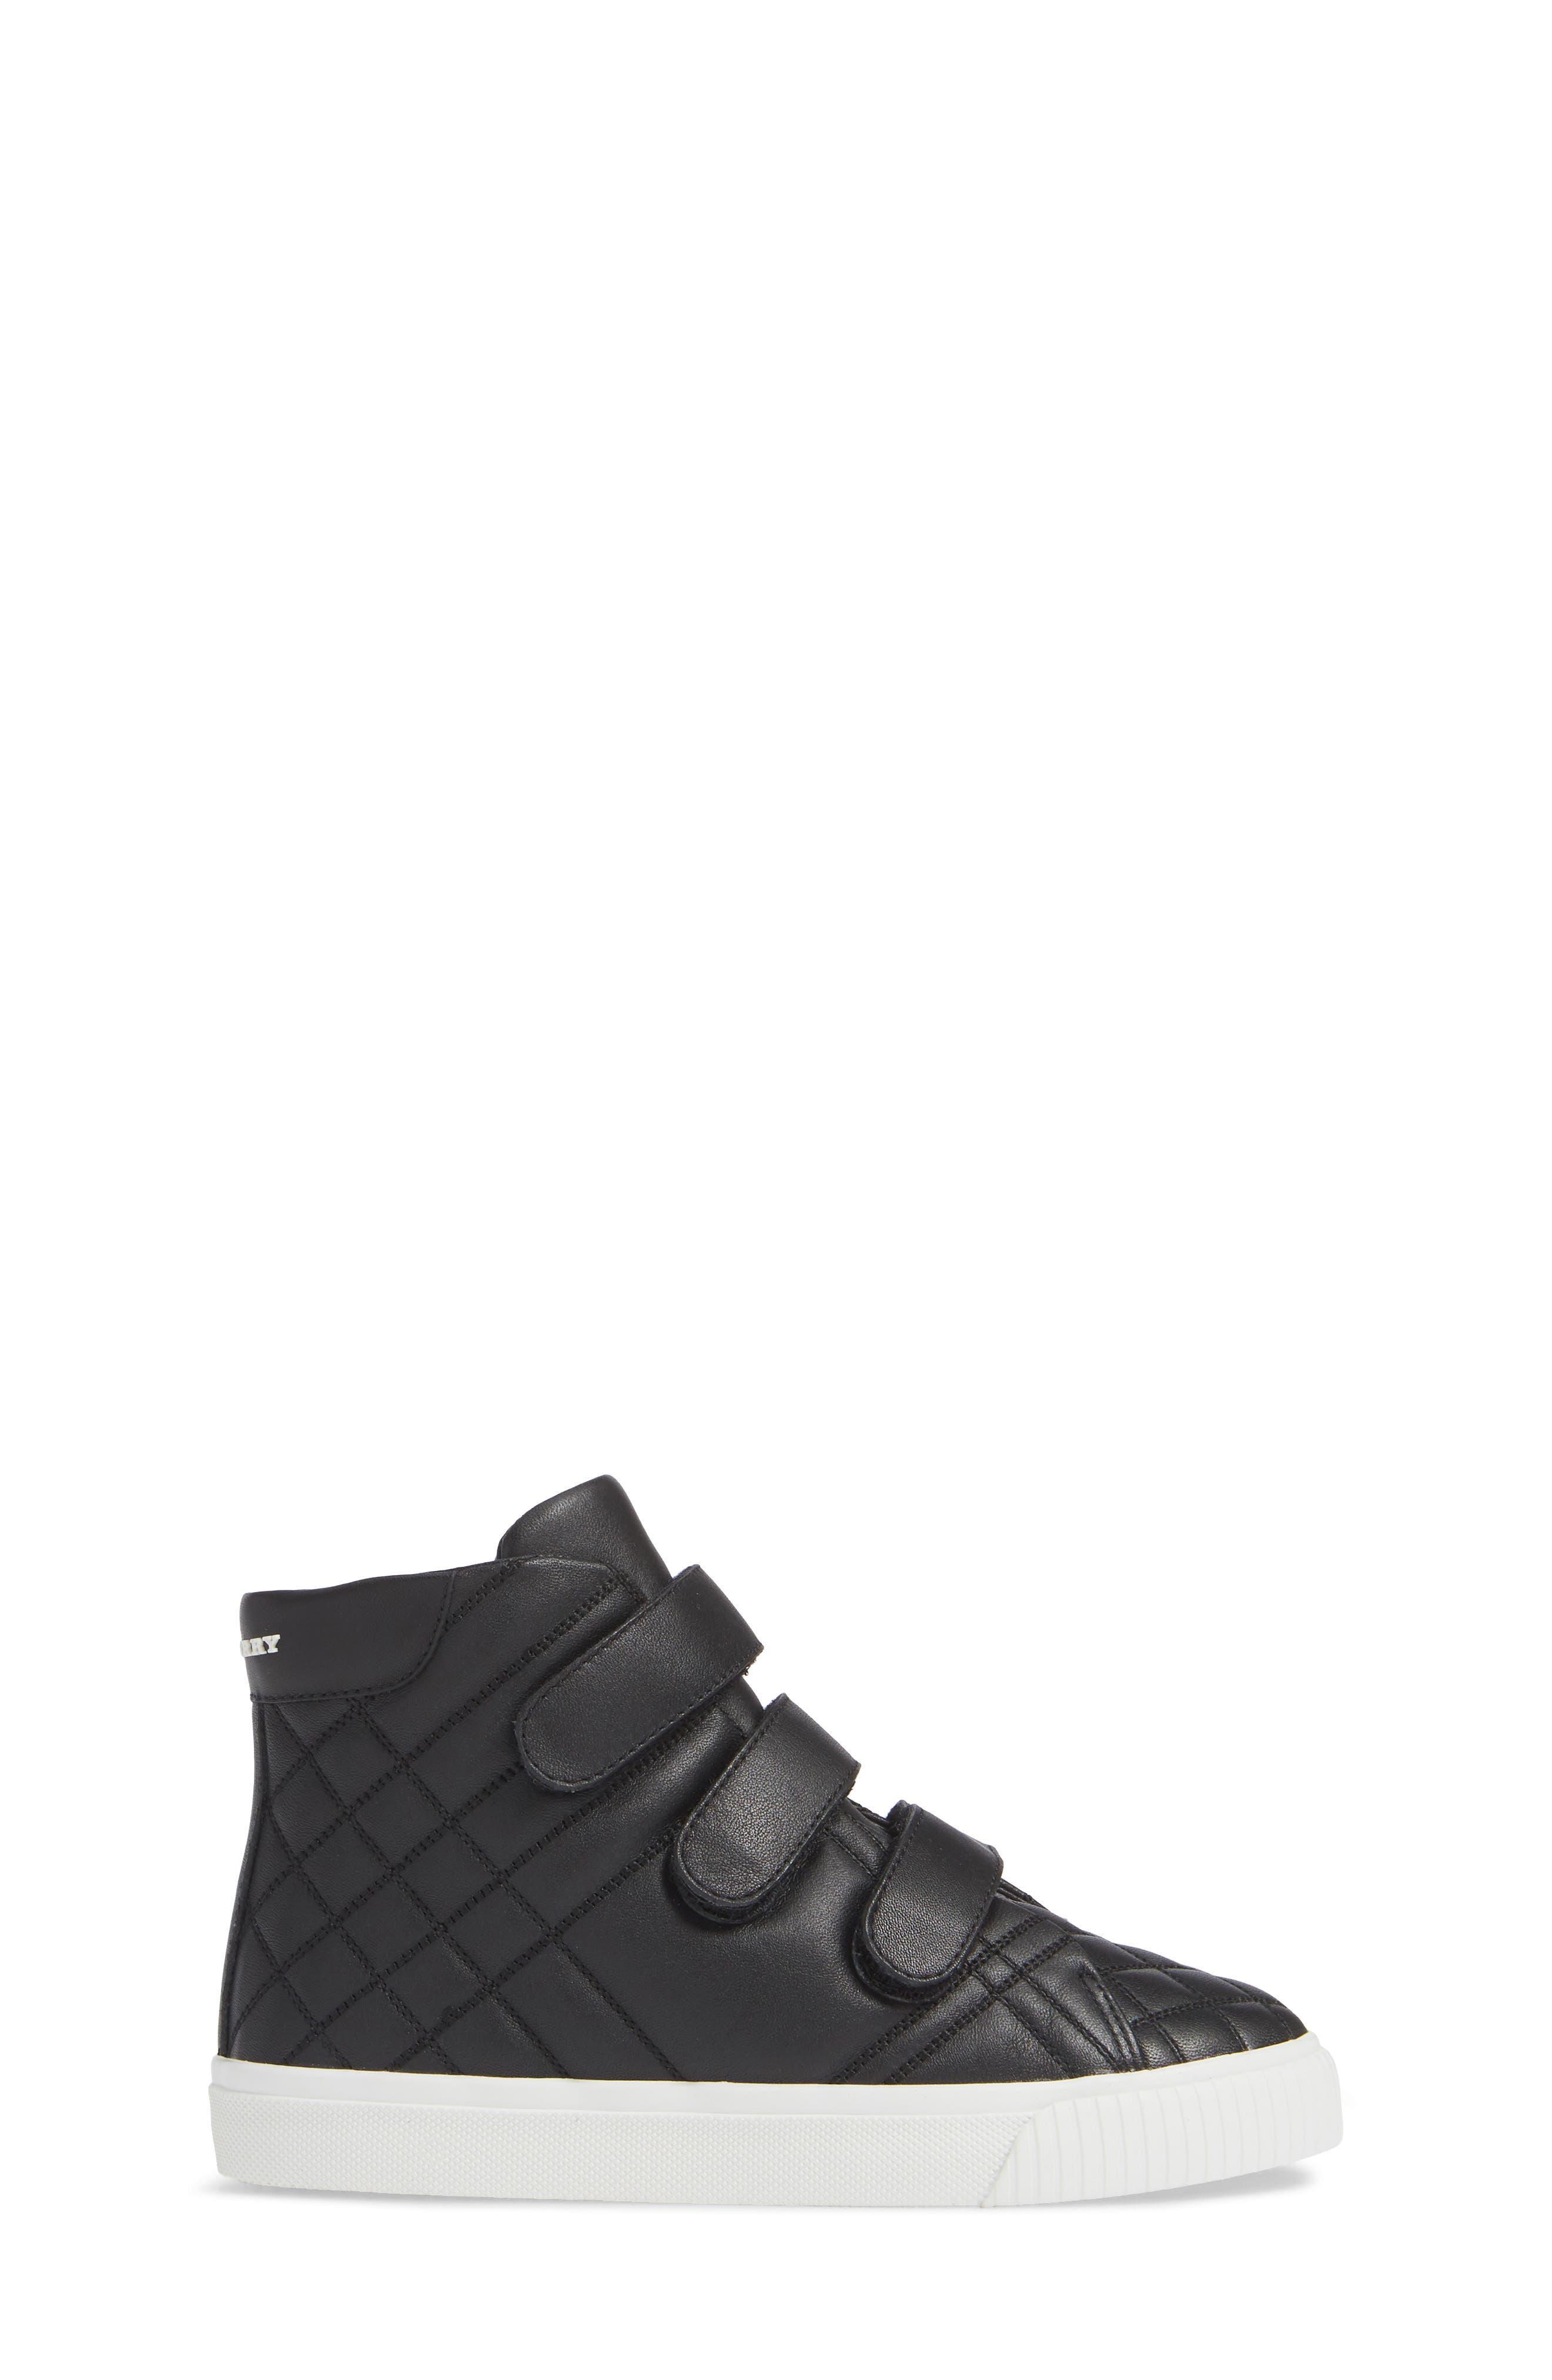 Sturrock Hi Top Sneaker,                             Alternate thumbnail 3, color,                             BLACK